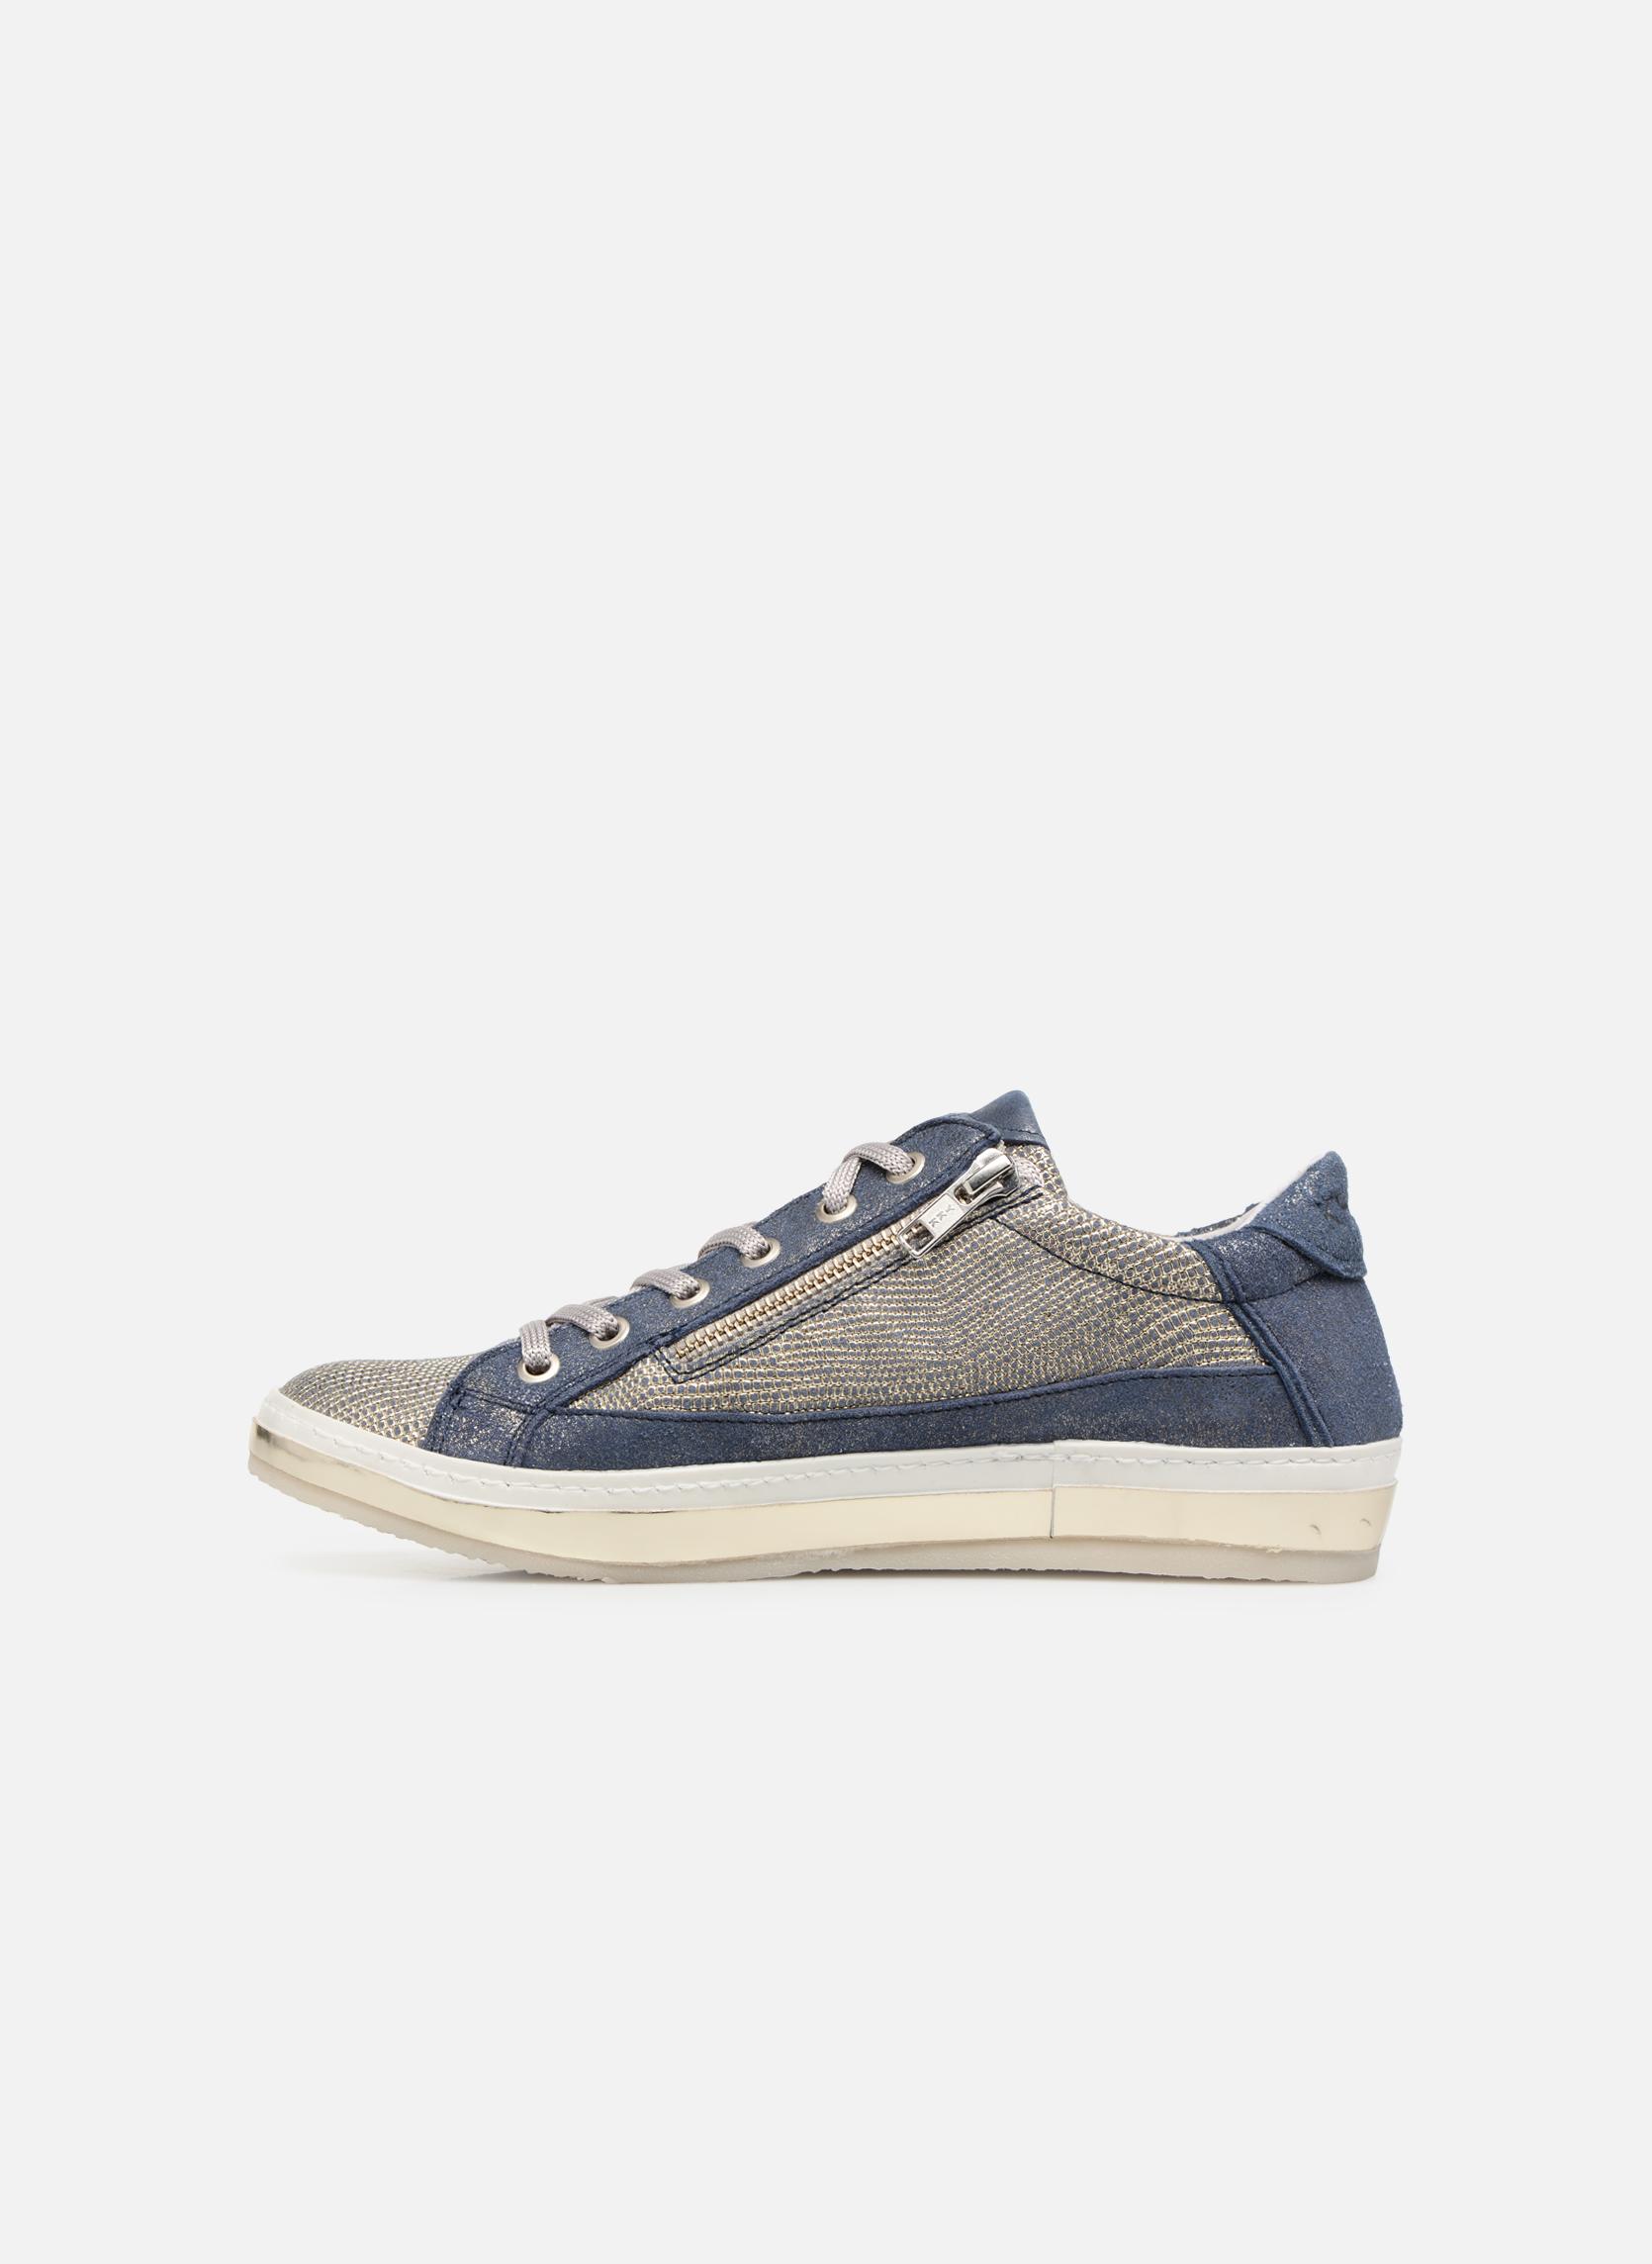 Giulia Maryland Jeans + Passion Oceano